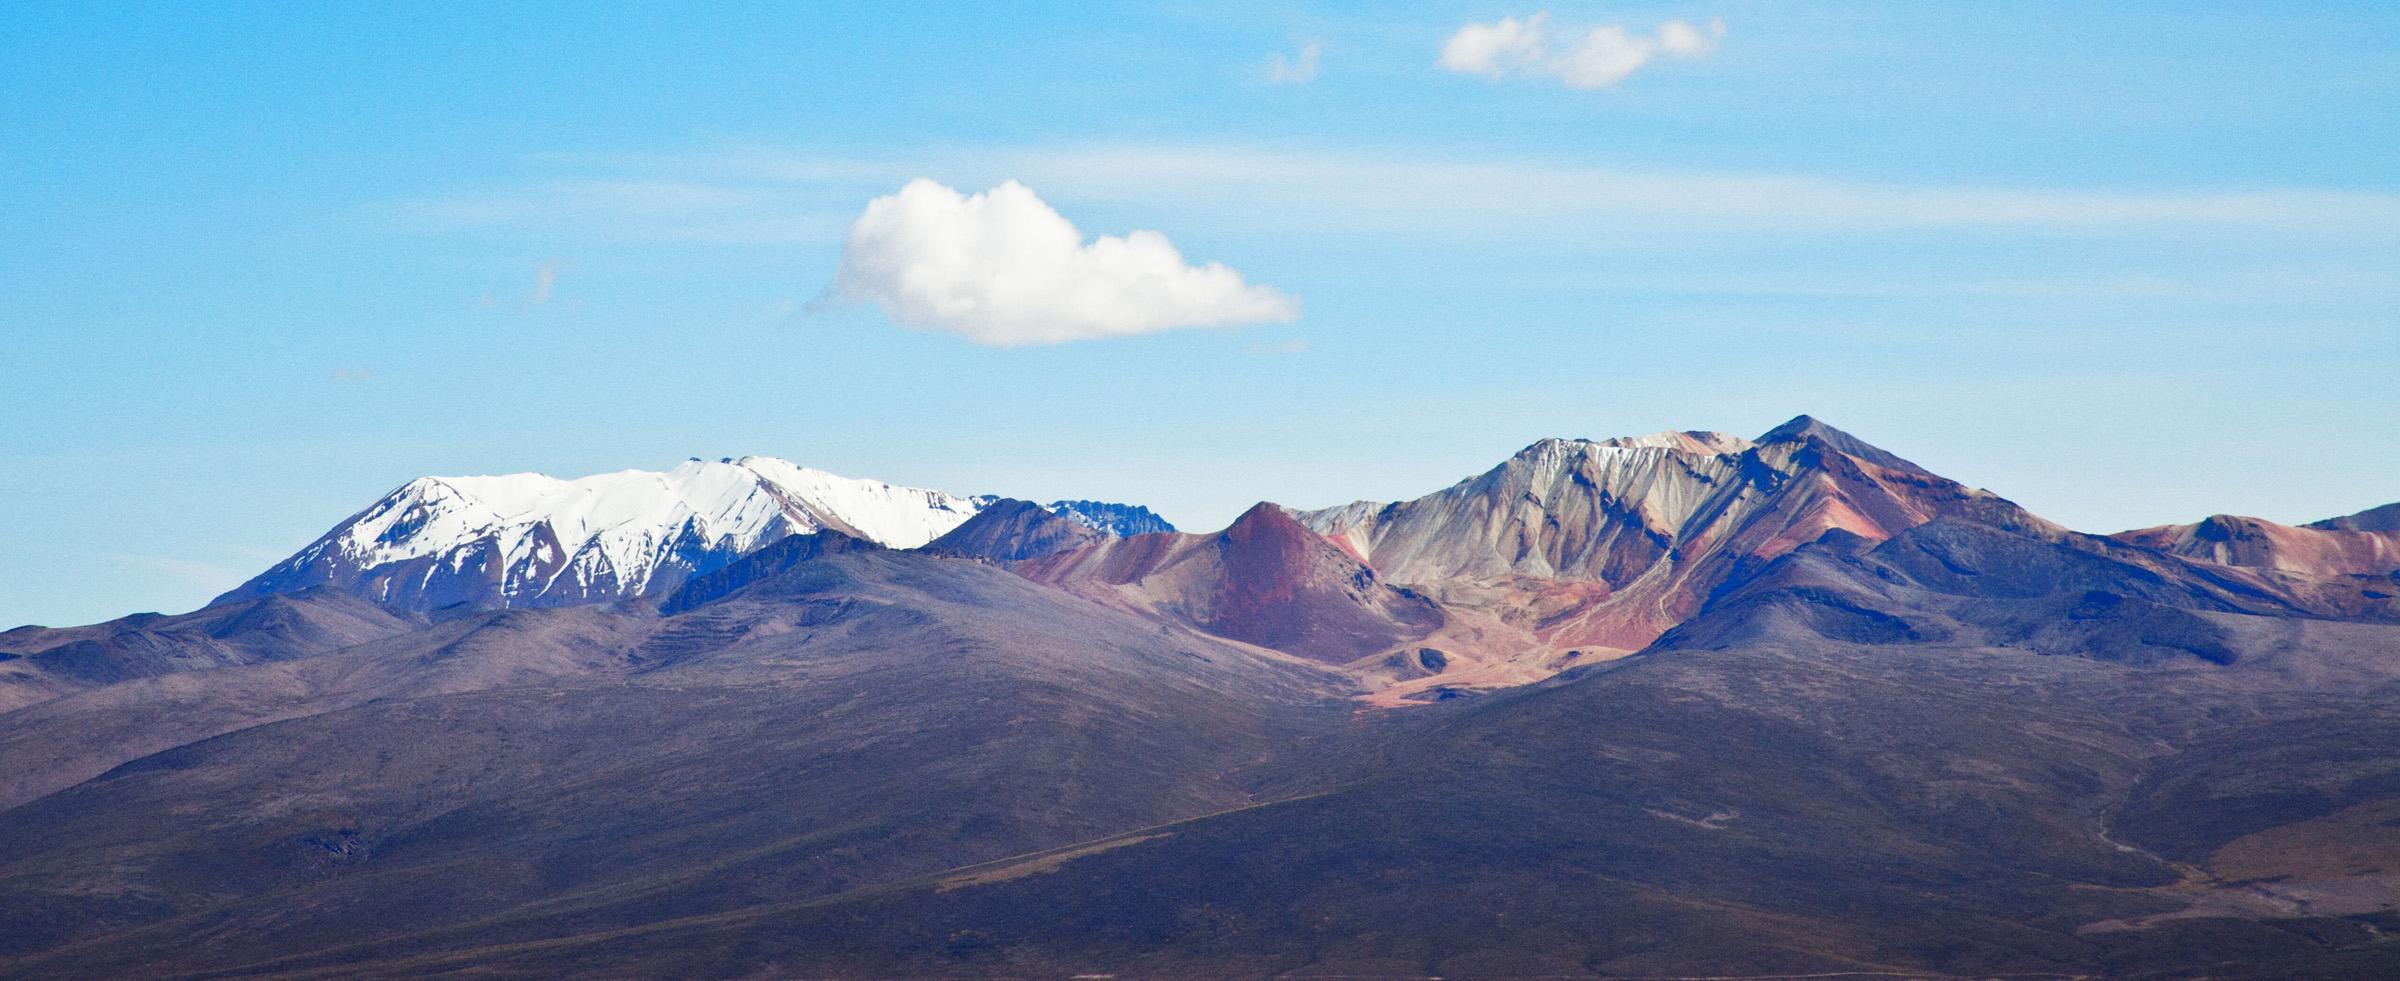 Quebrada de Allane, Chile - by Juan Cristóbal Hurtado